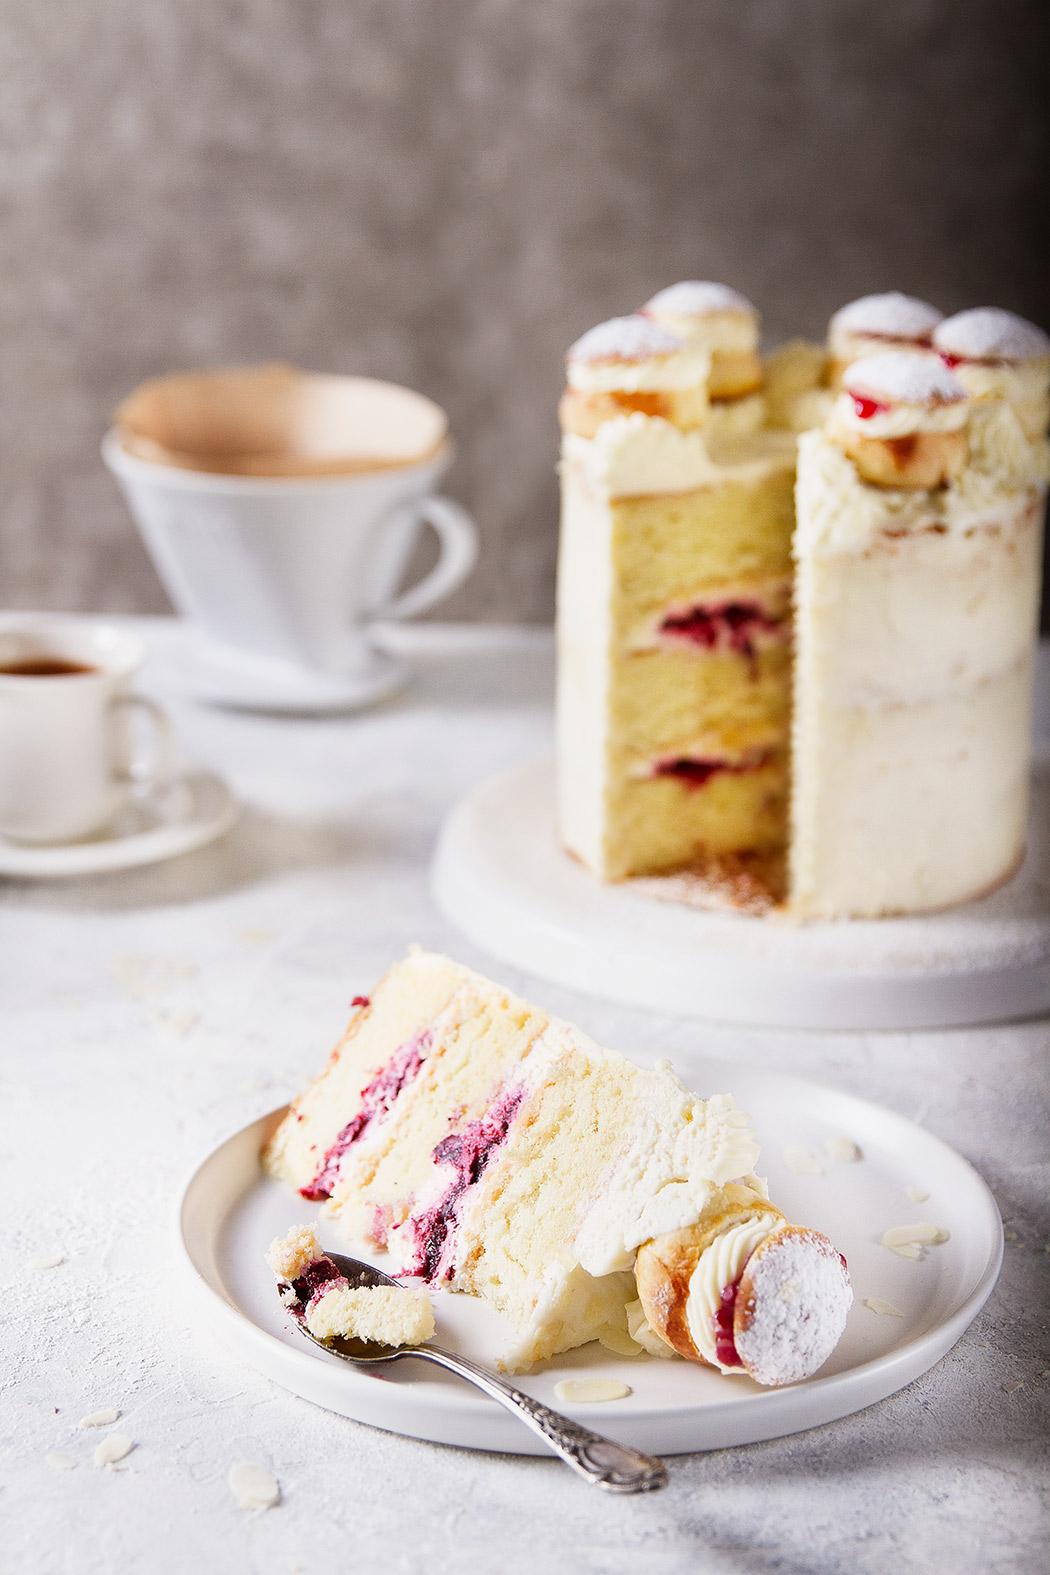 Shrovetide cake with buns